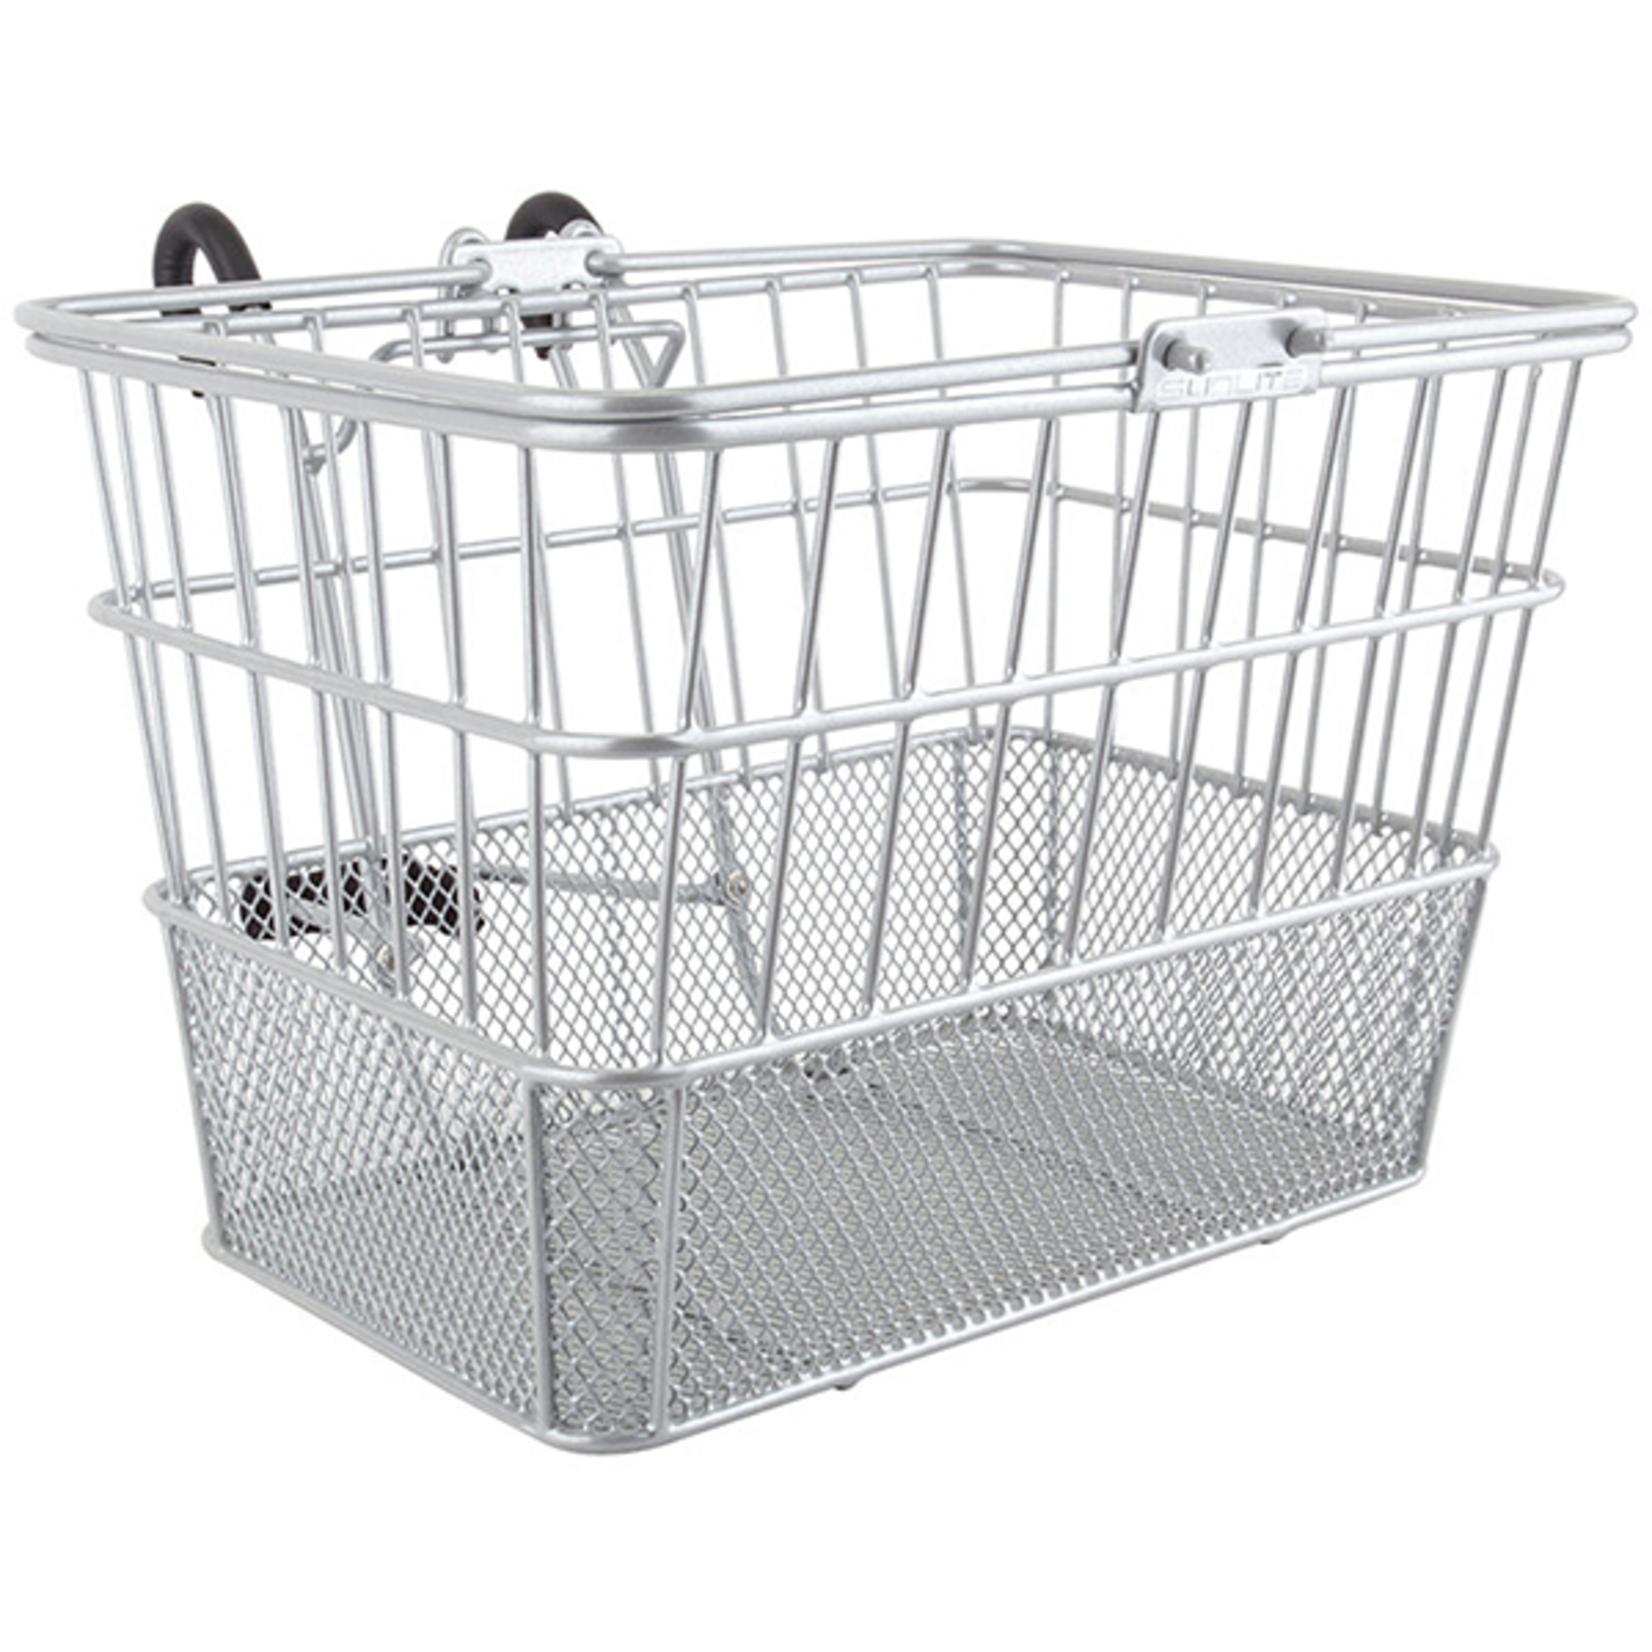 Sunlite Basket Silver